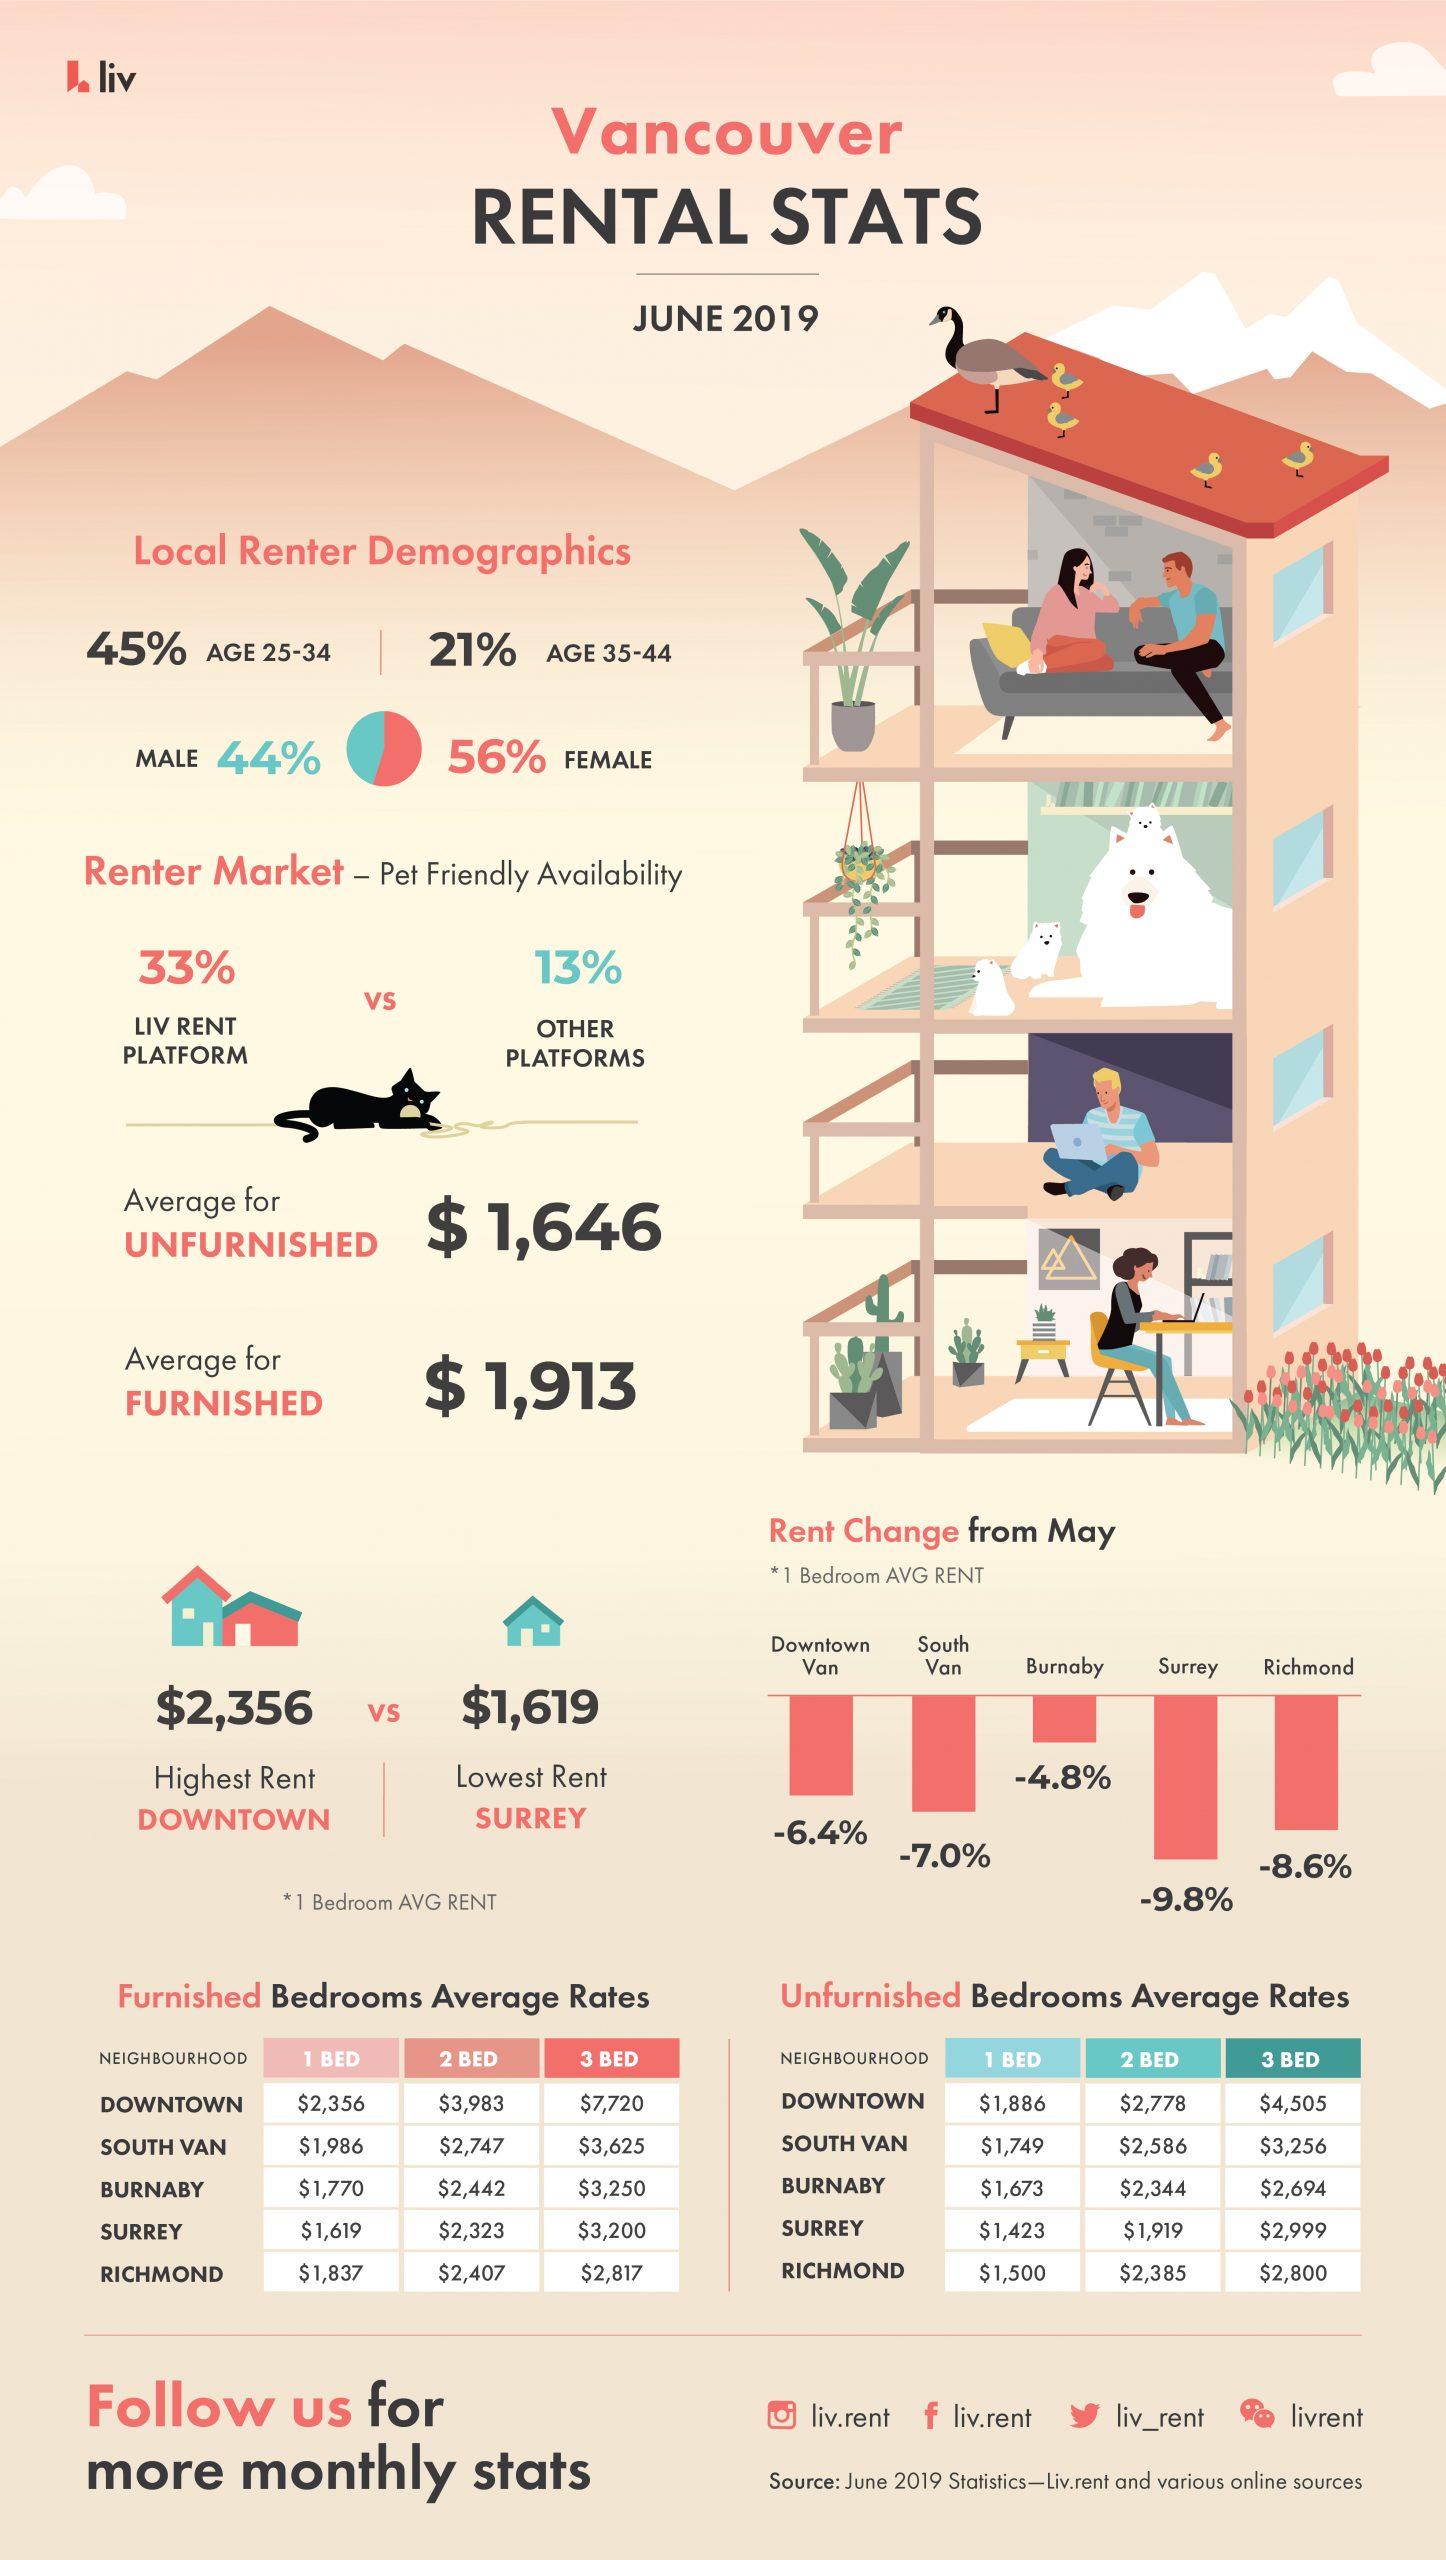 Vancouver Rental Stats June 2019 - Average Rental Prices - Renter demographics - Renter Market